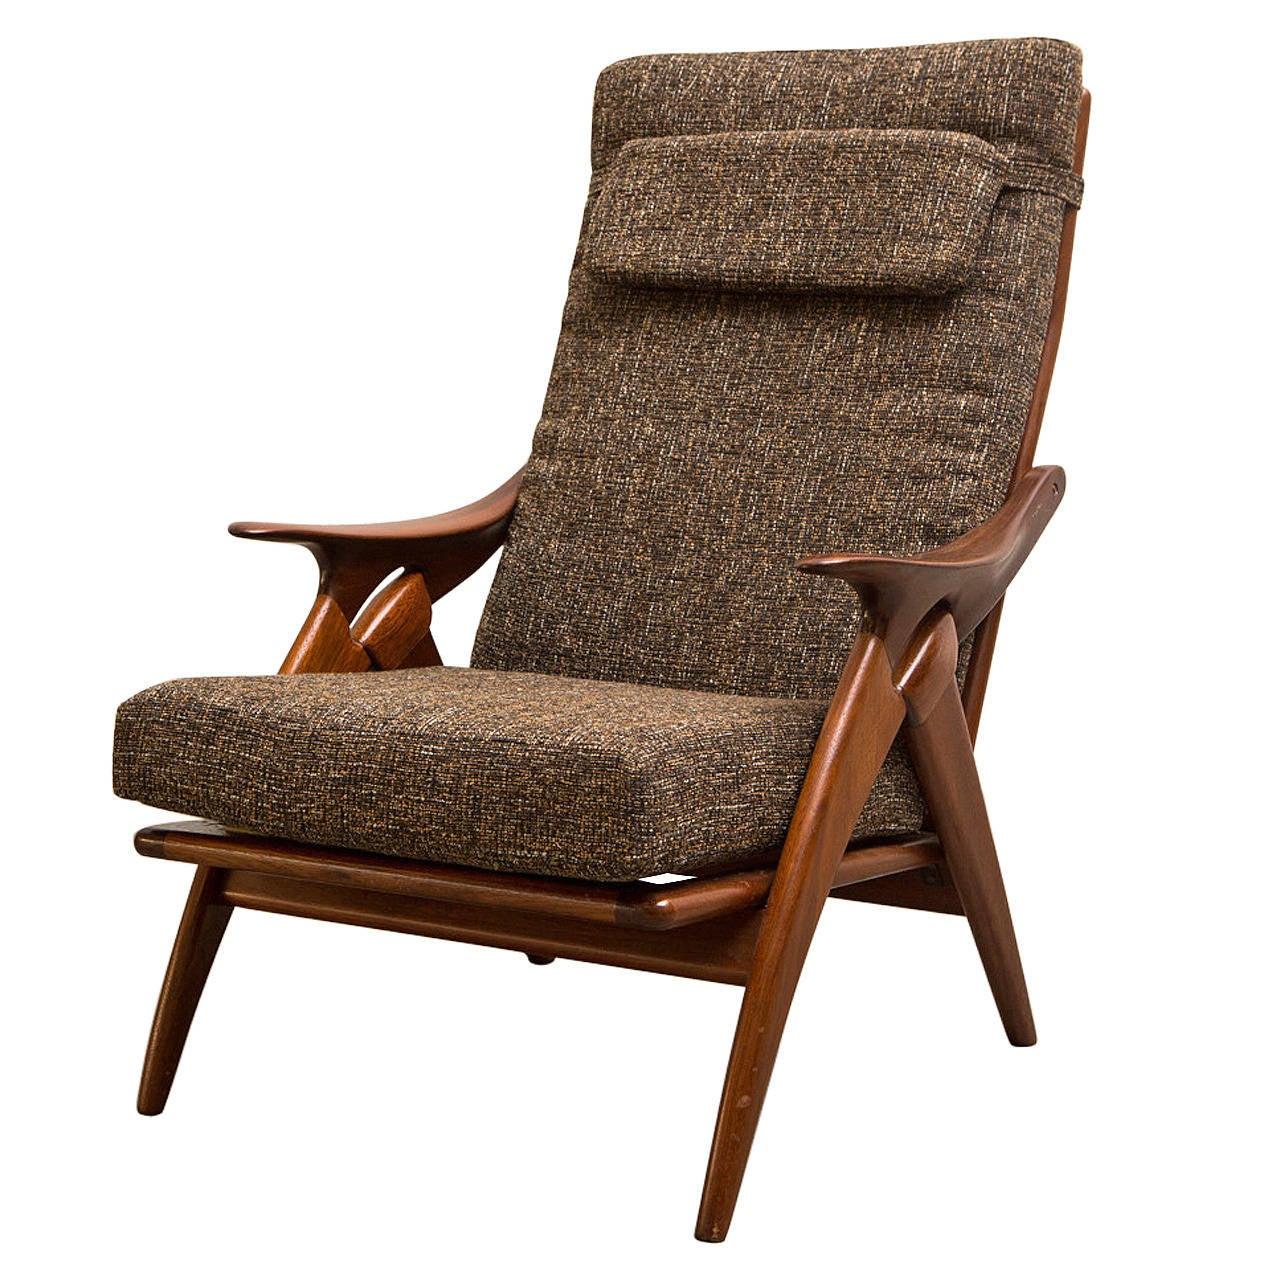 De Ster Mid Century Teak Lounge Chair at 1stdibs